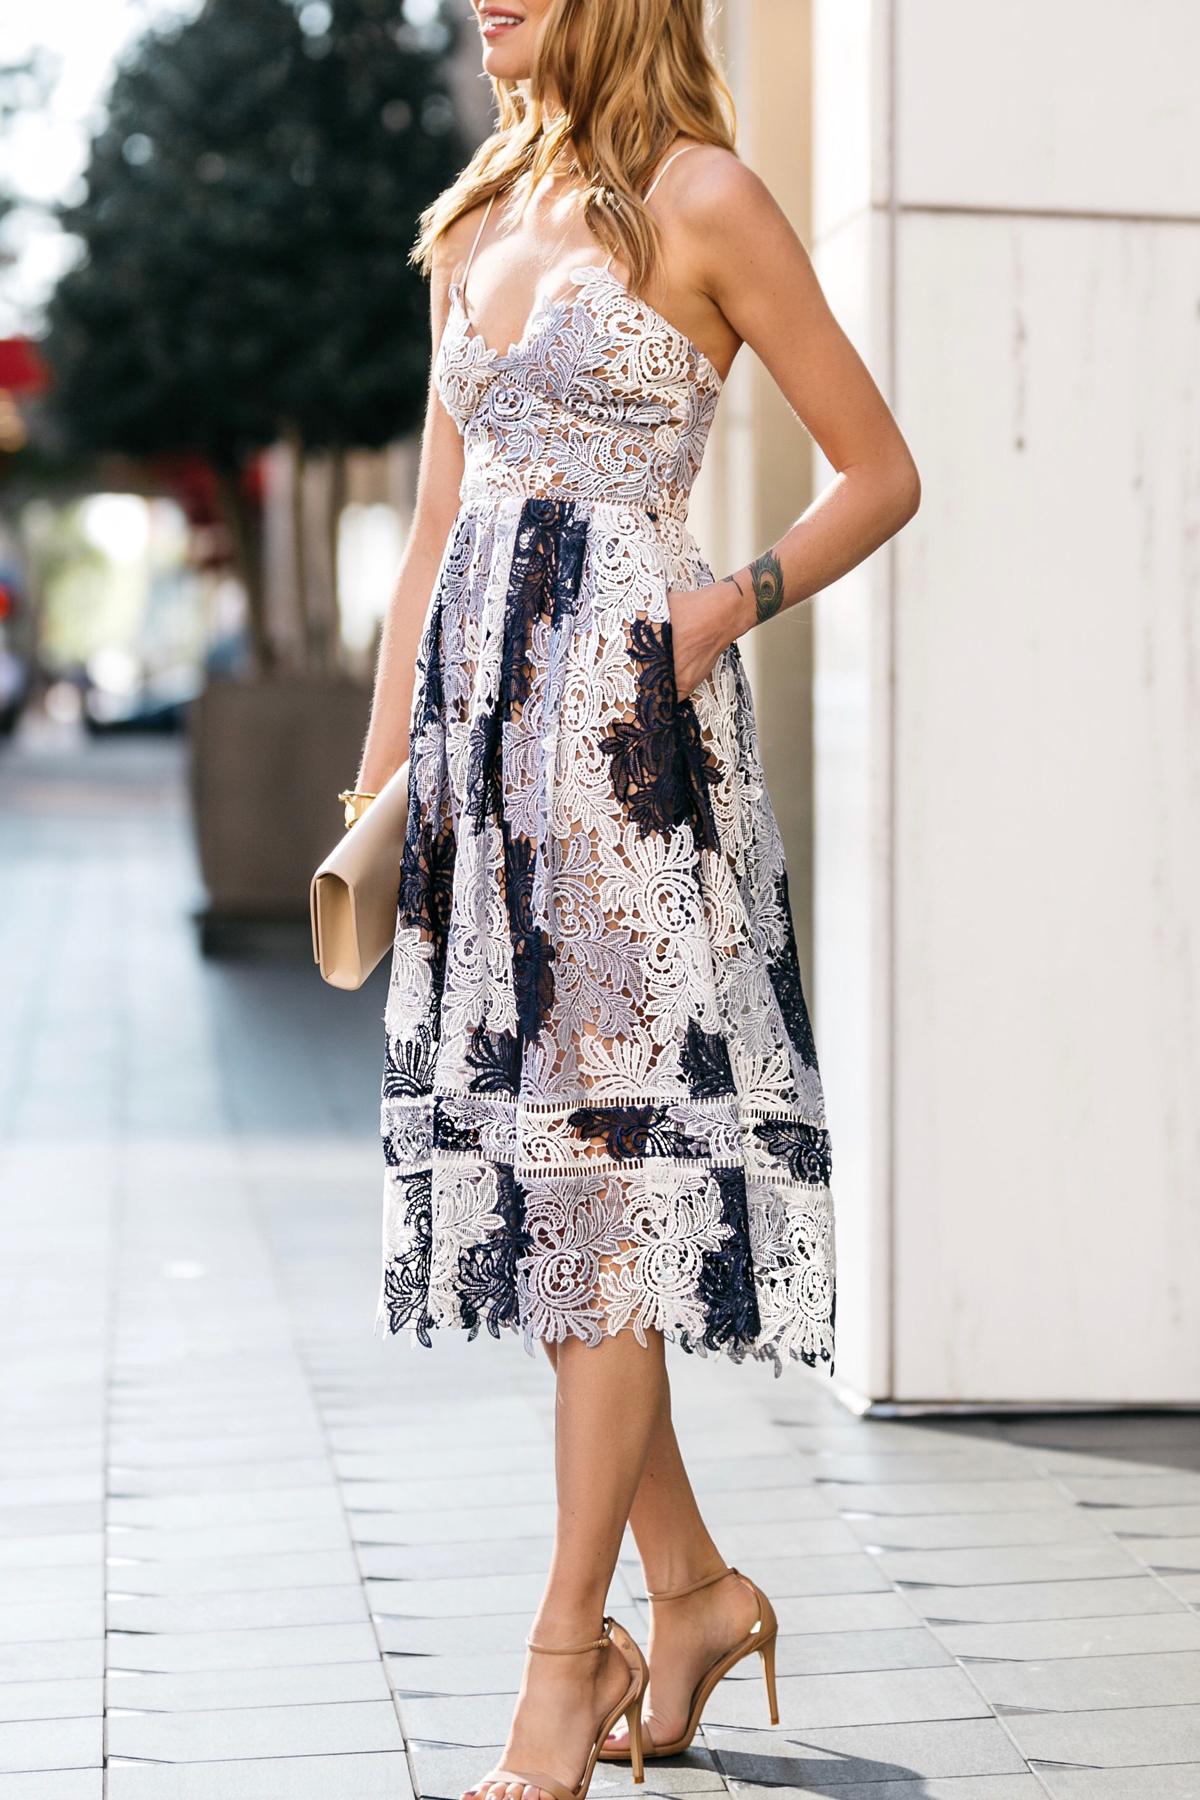 Fashion Jackson, Dallas Blogger, Fashion Blogger, Street Style, Self-Portrait Camellias Lace Dress, Saint Laurent Monogram Clutch, Steve Madden Ankle Strap Heeled Sandals